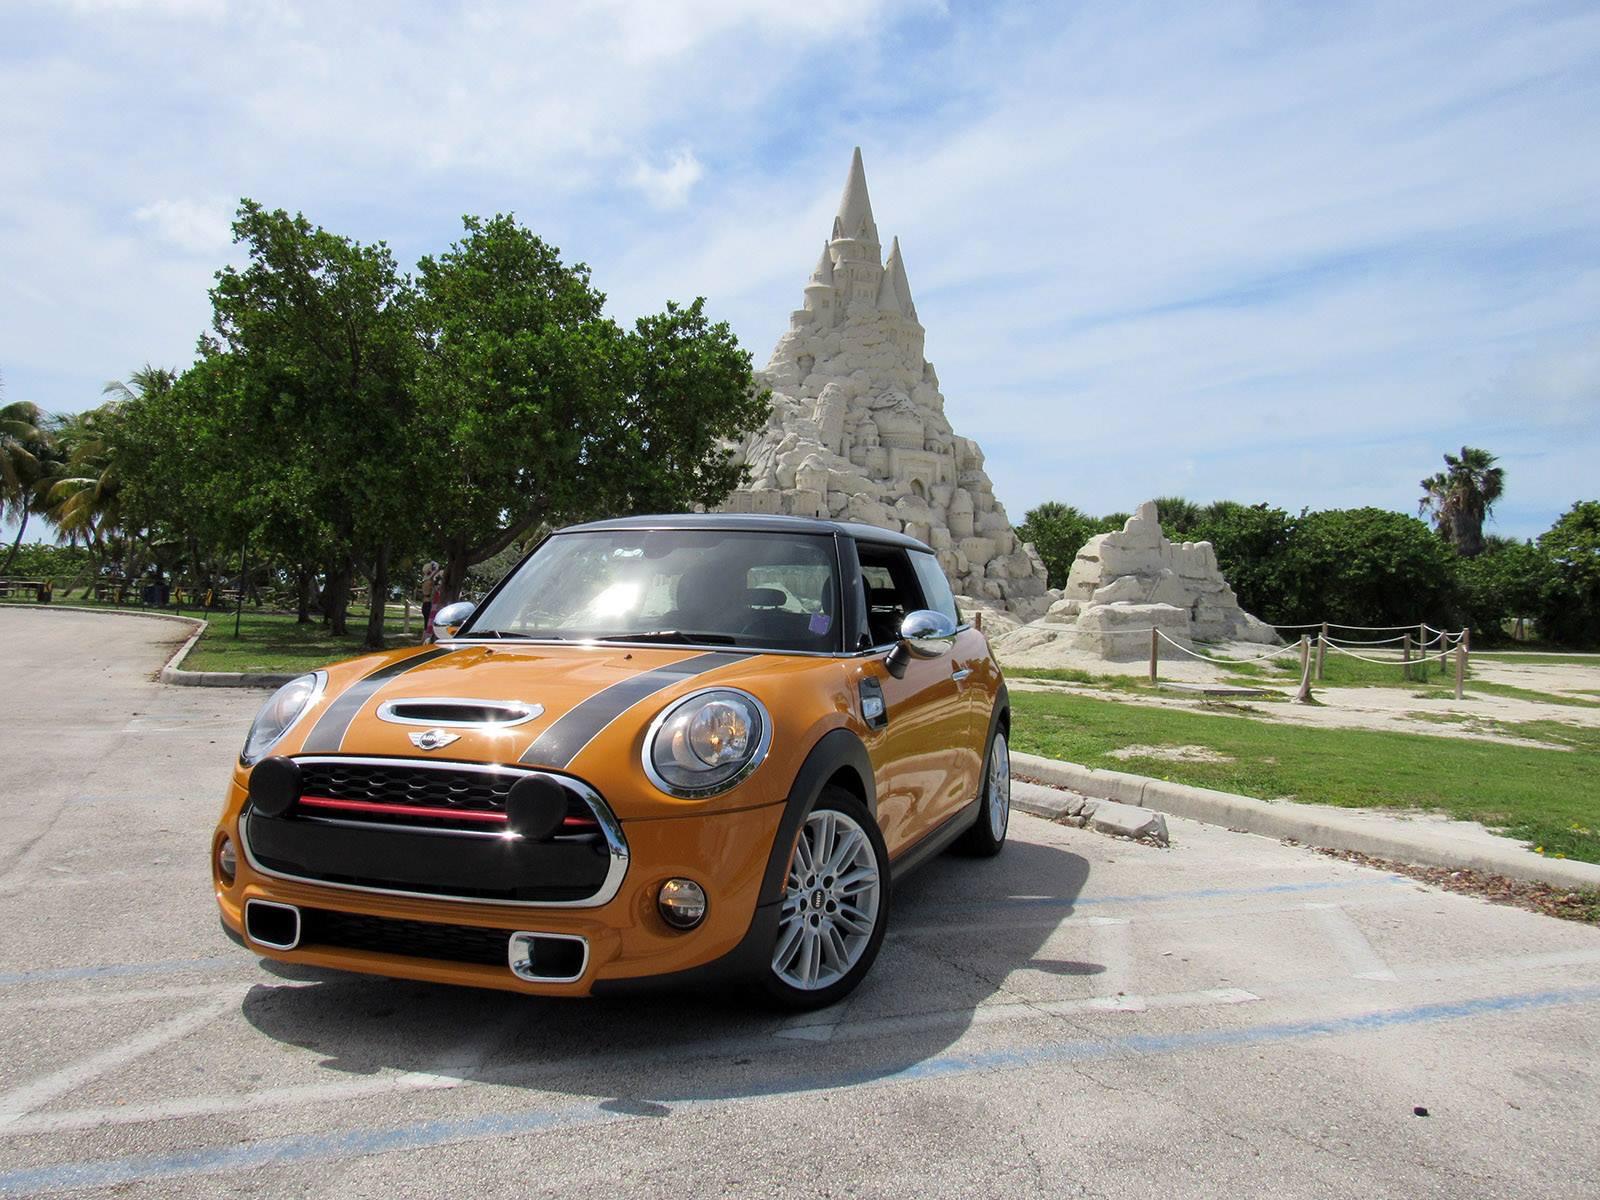 Virginia Beach Monthly Car Rentals